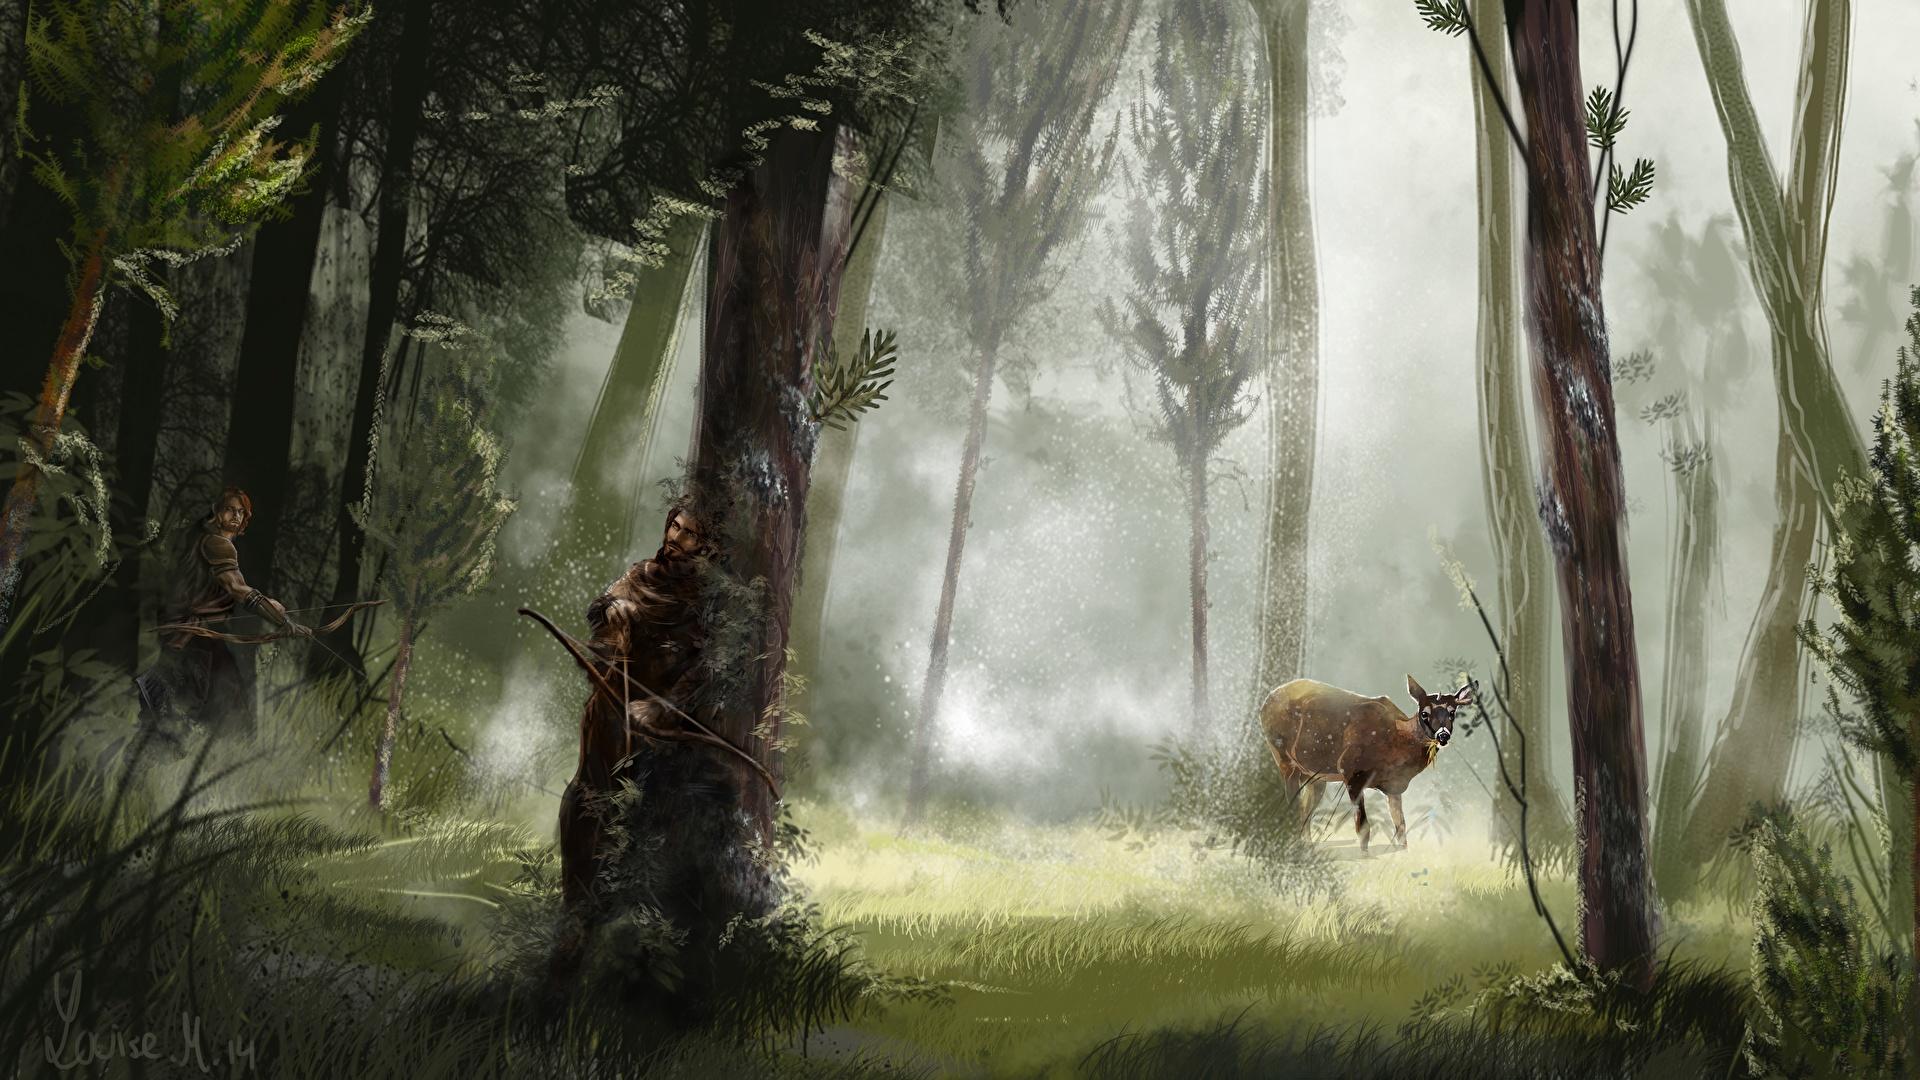 Desktop Wallpapers Deer Archers Warriors Fantasy Forest